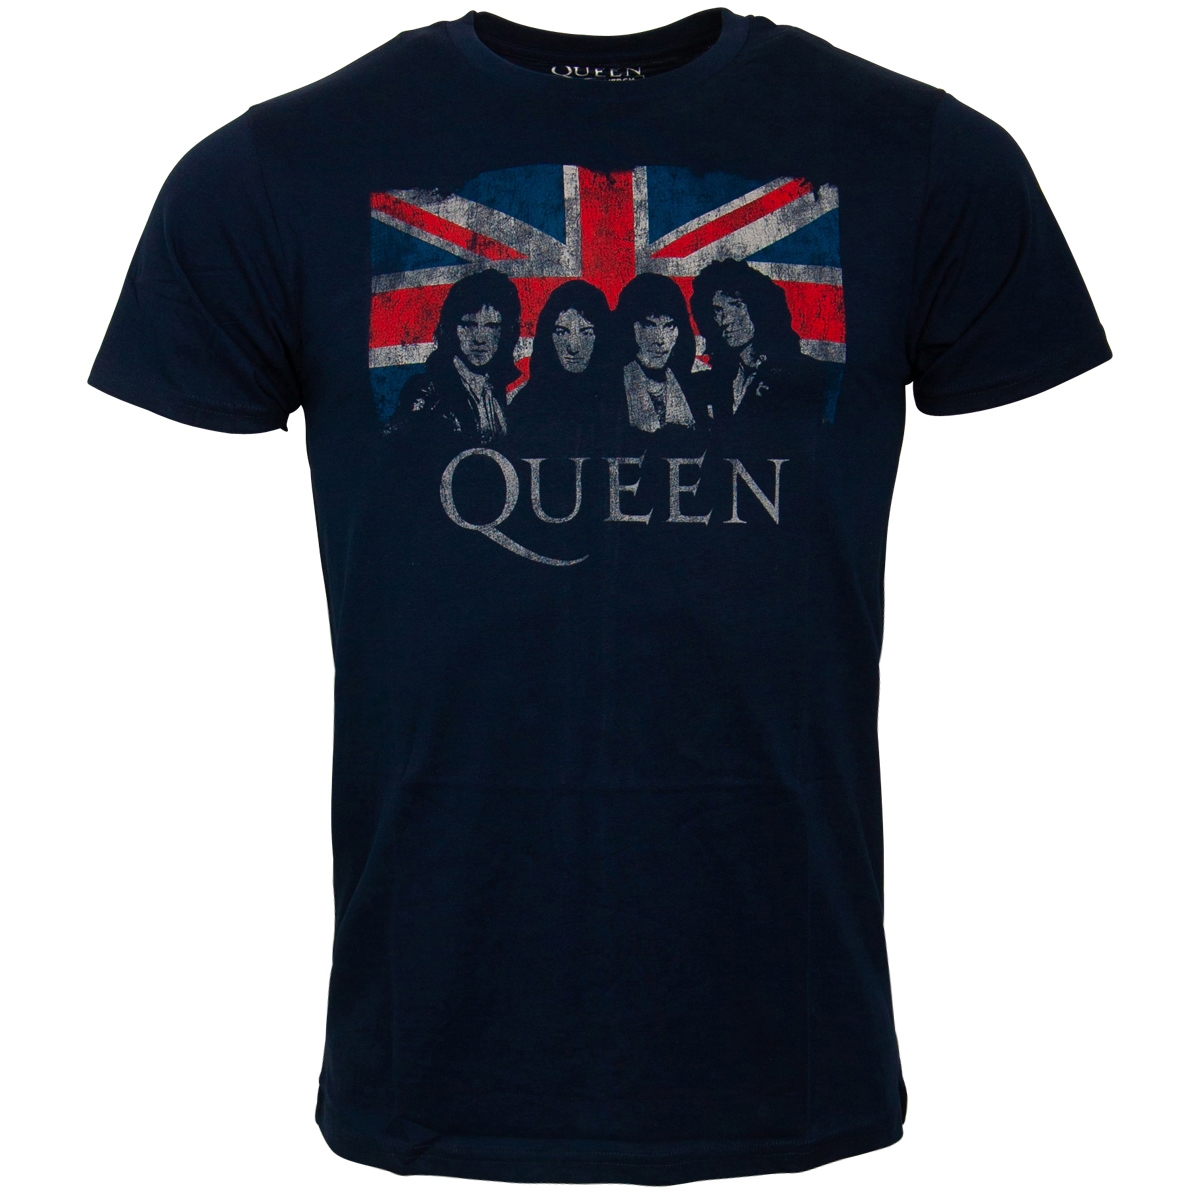 Queen - T-Shirt Union Jack - dunkelblau